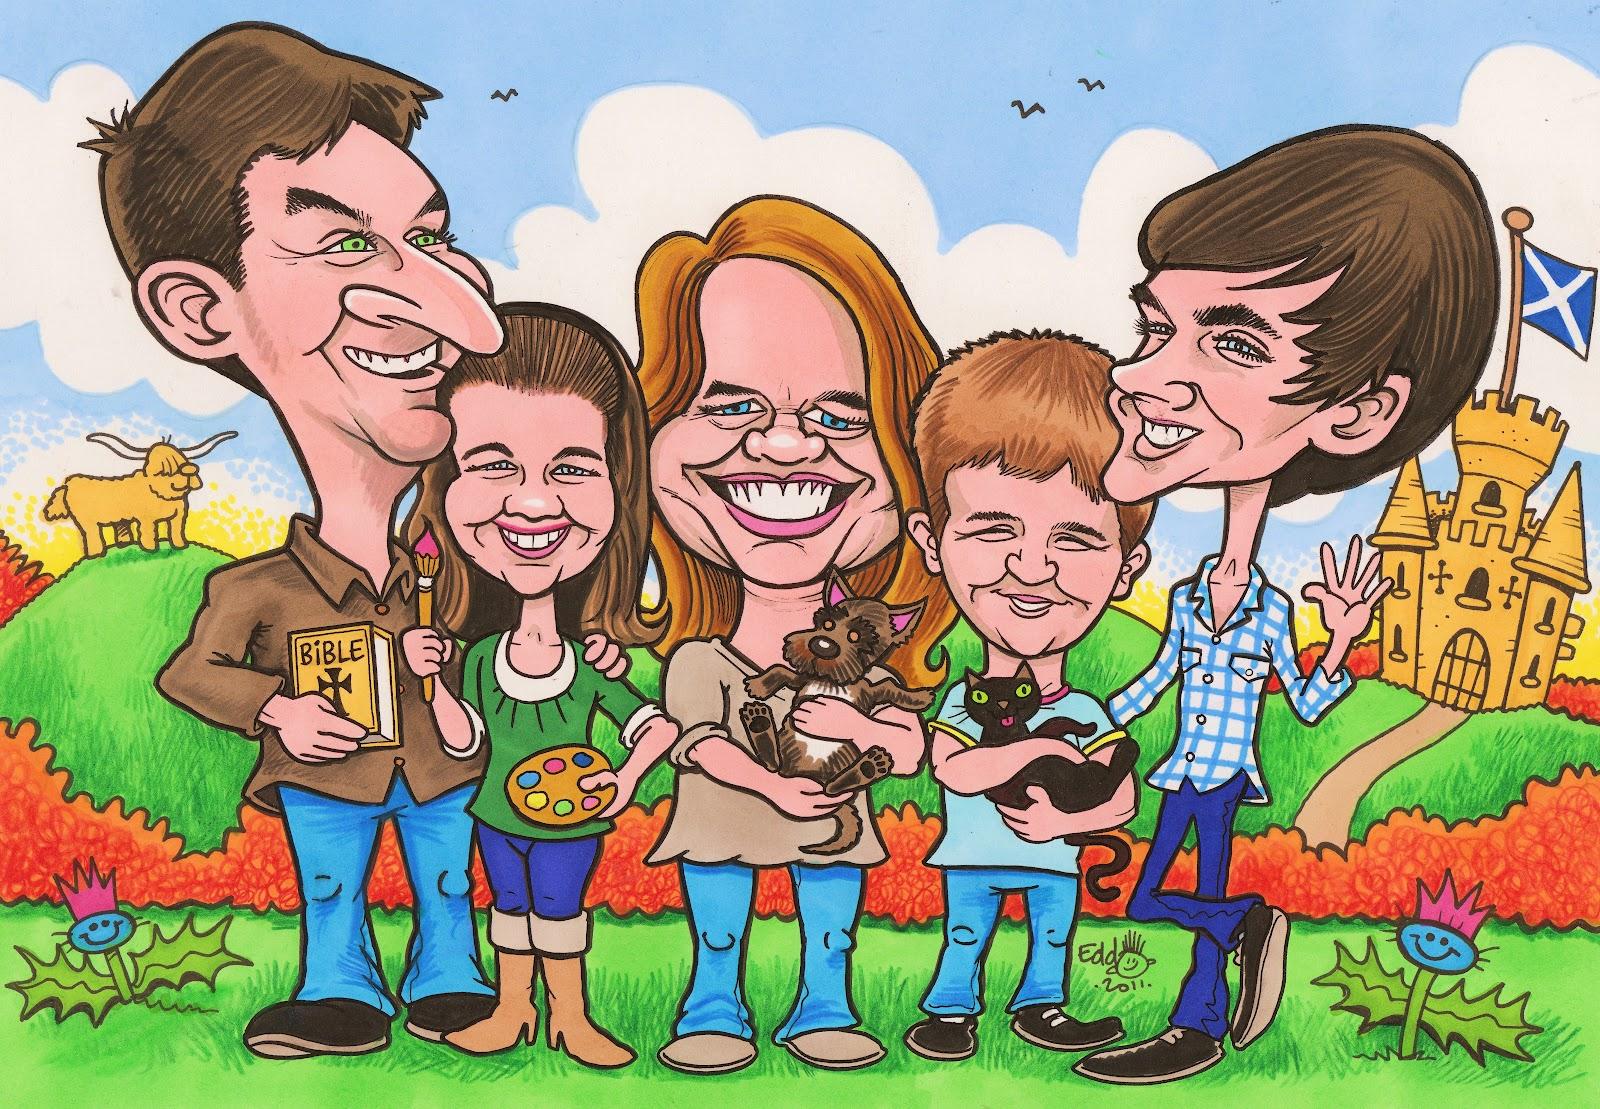 Edd Travers Caricature Blog: February 2012